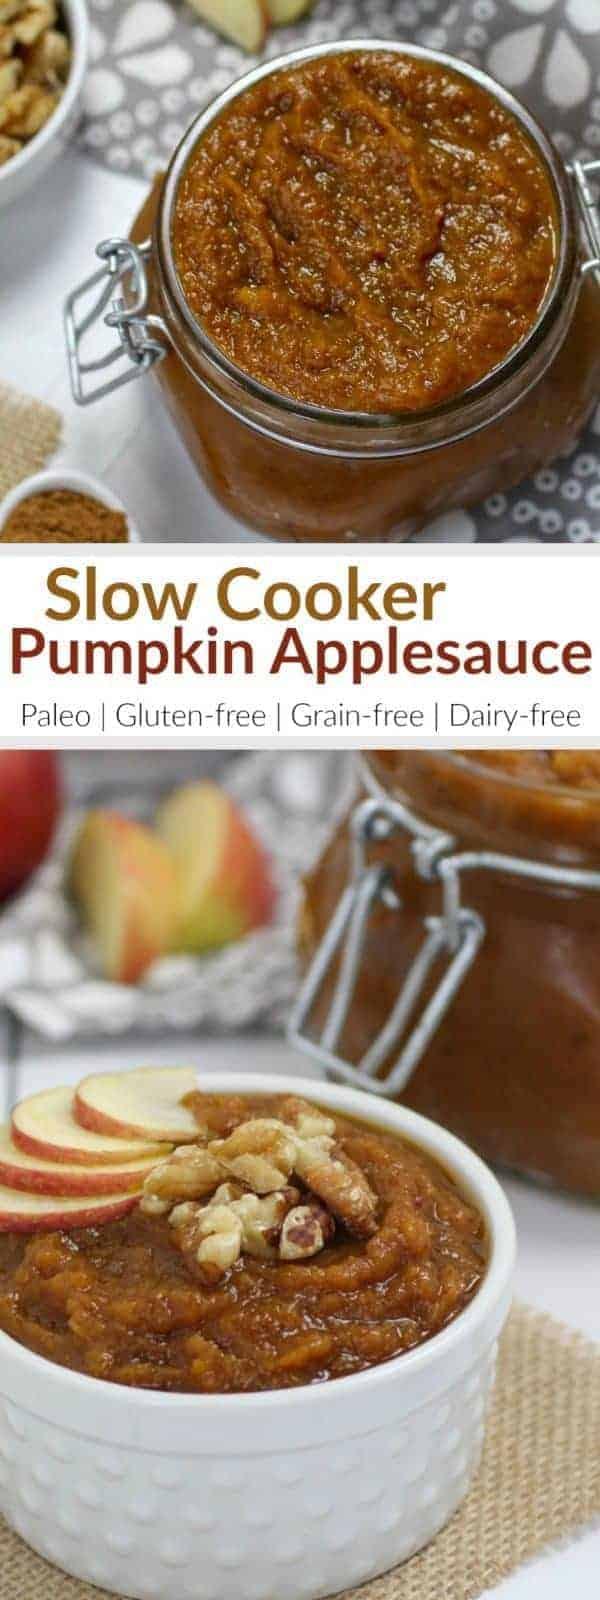 Pinterest image for Slow-Cooker Pumpkin Applesauce